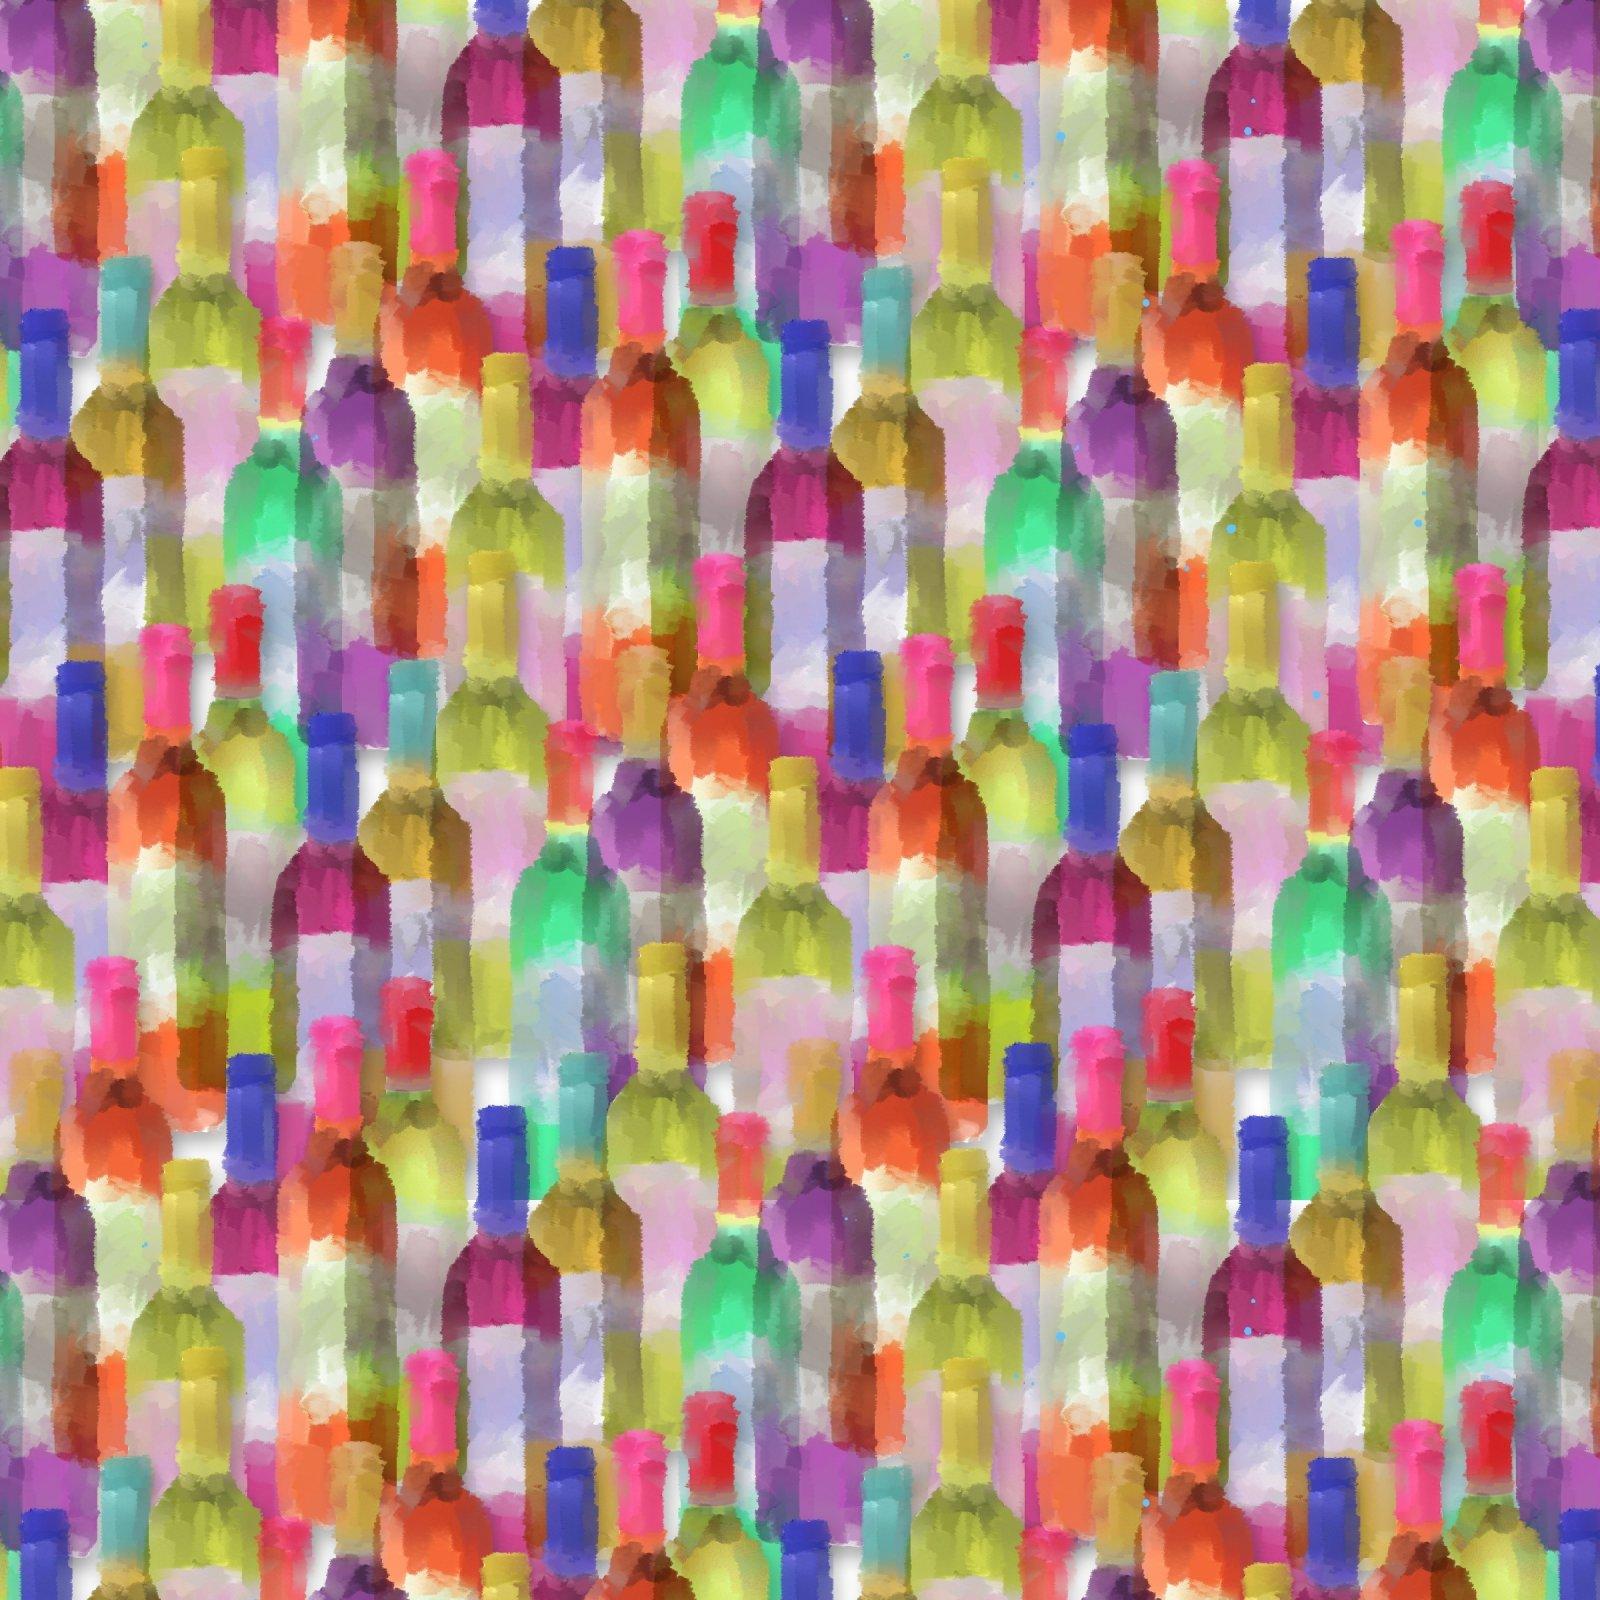 Sip & Snip Wine Bottles 14904